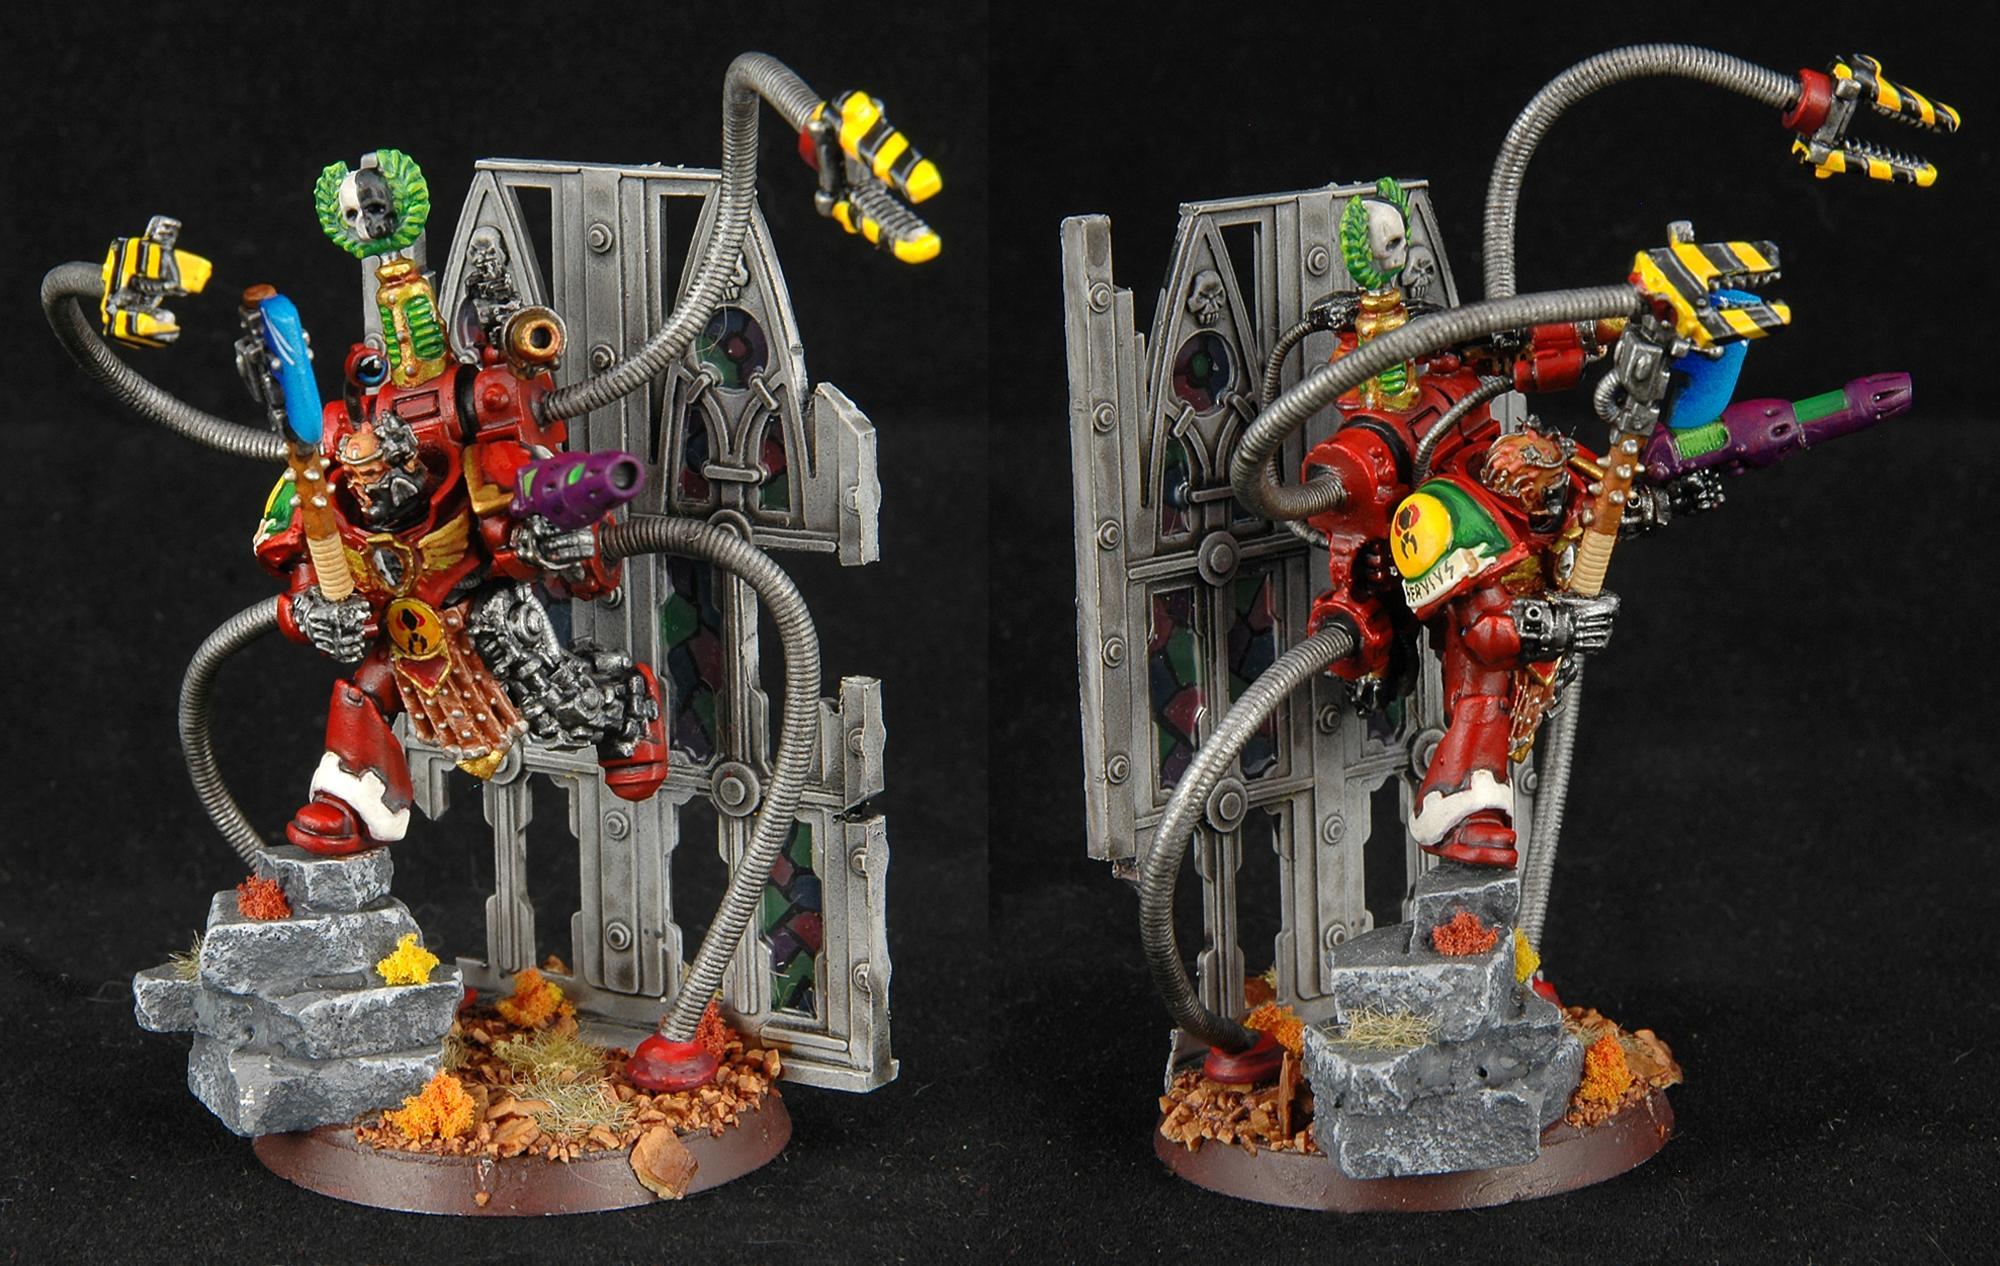 Mantis Warriors, Motf, Space Marines, Warhammer 40,000